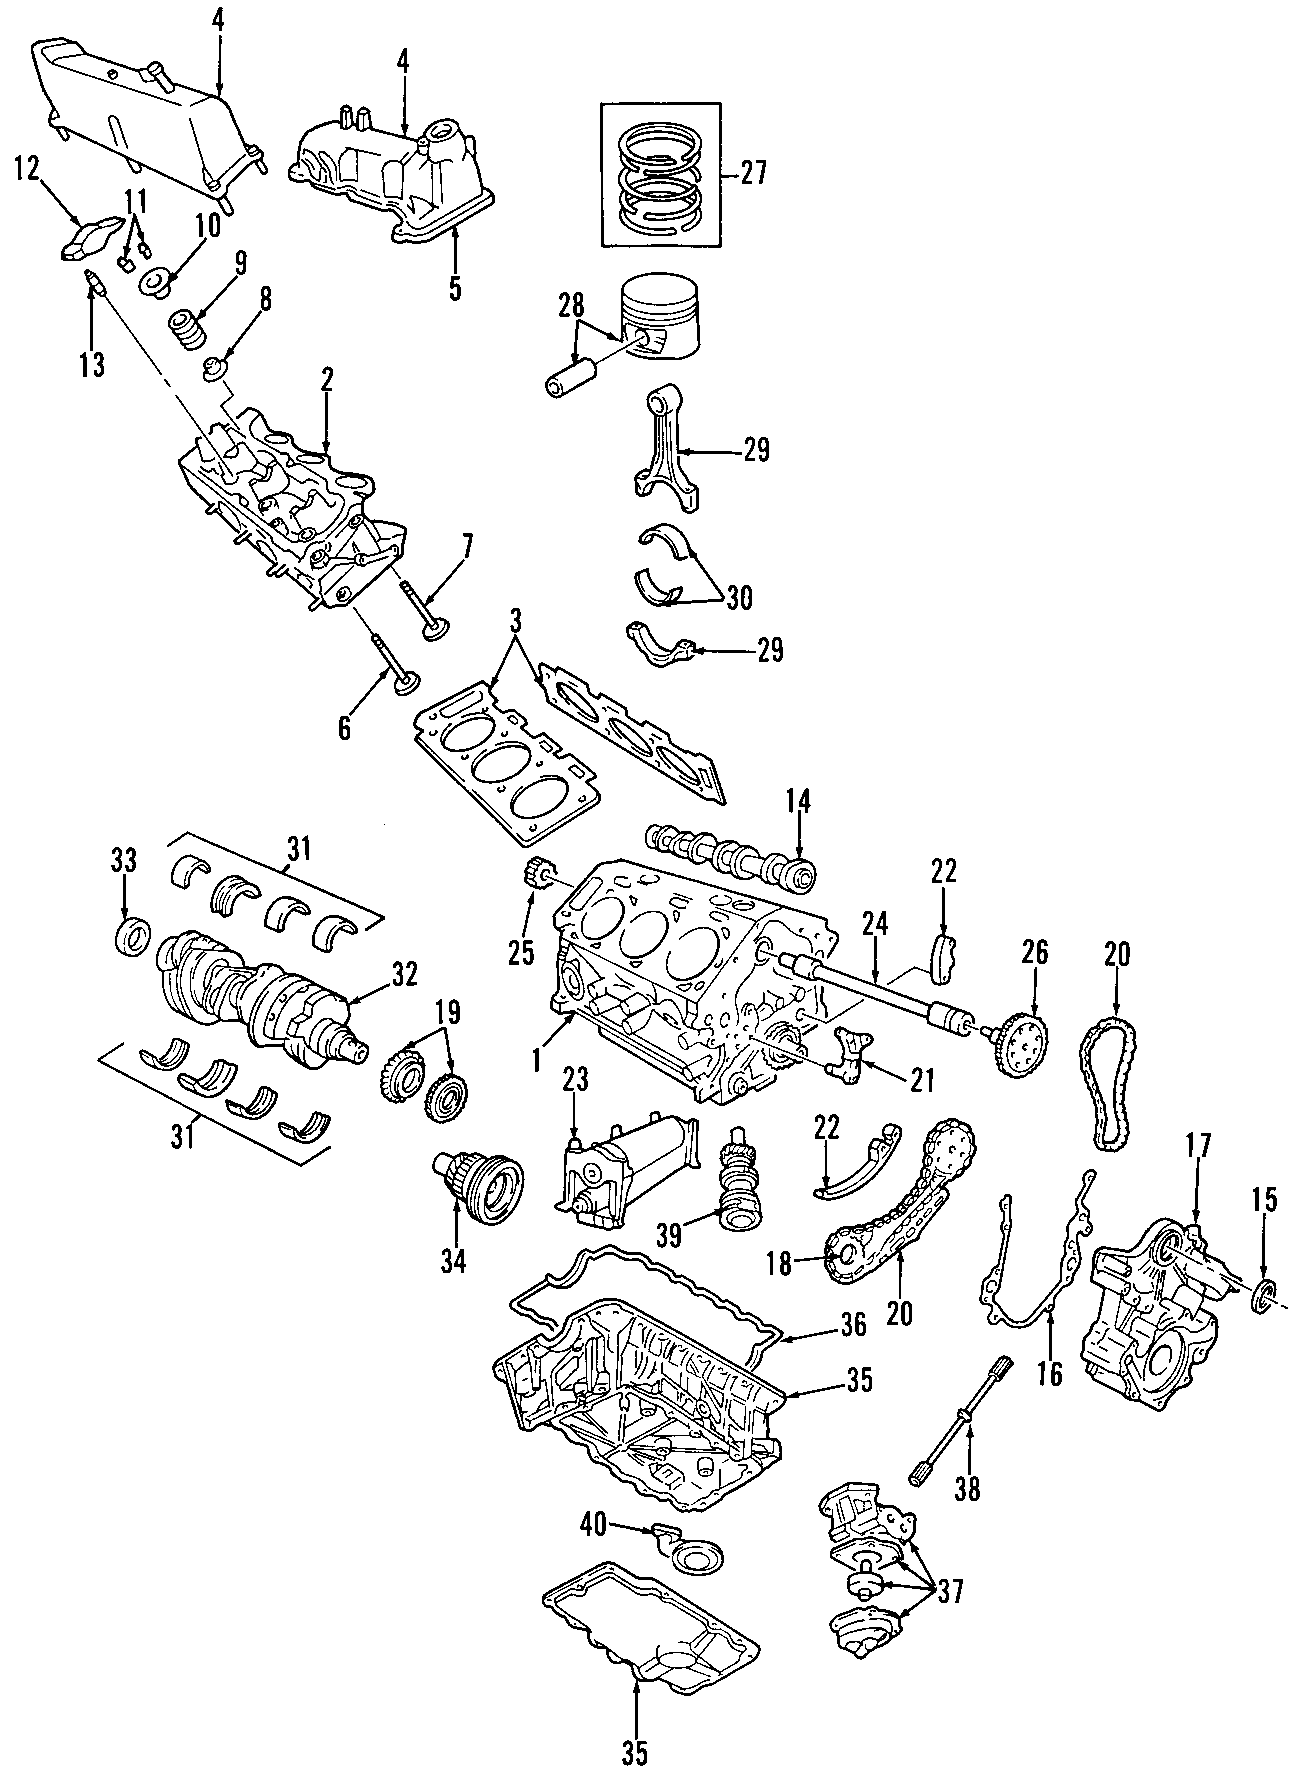 2004 Mazda Engine Balance Shaft Chain Guide  4 0 Liter